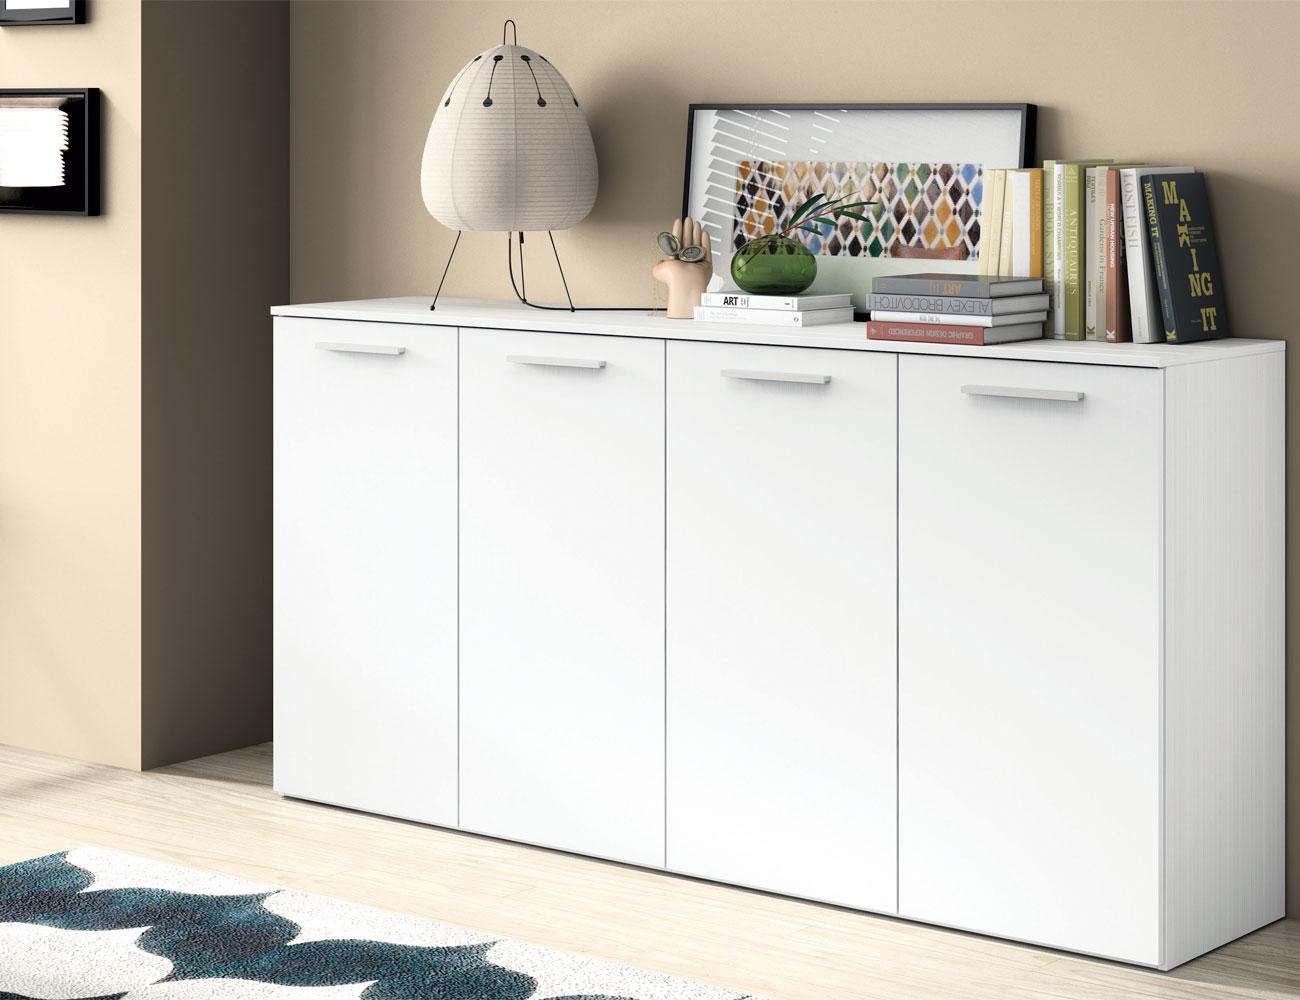 Mueble salon moderno aparador blanco 4143